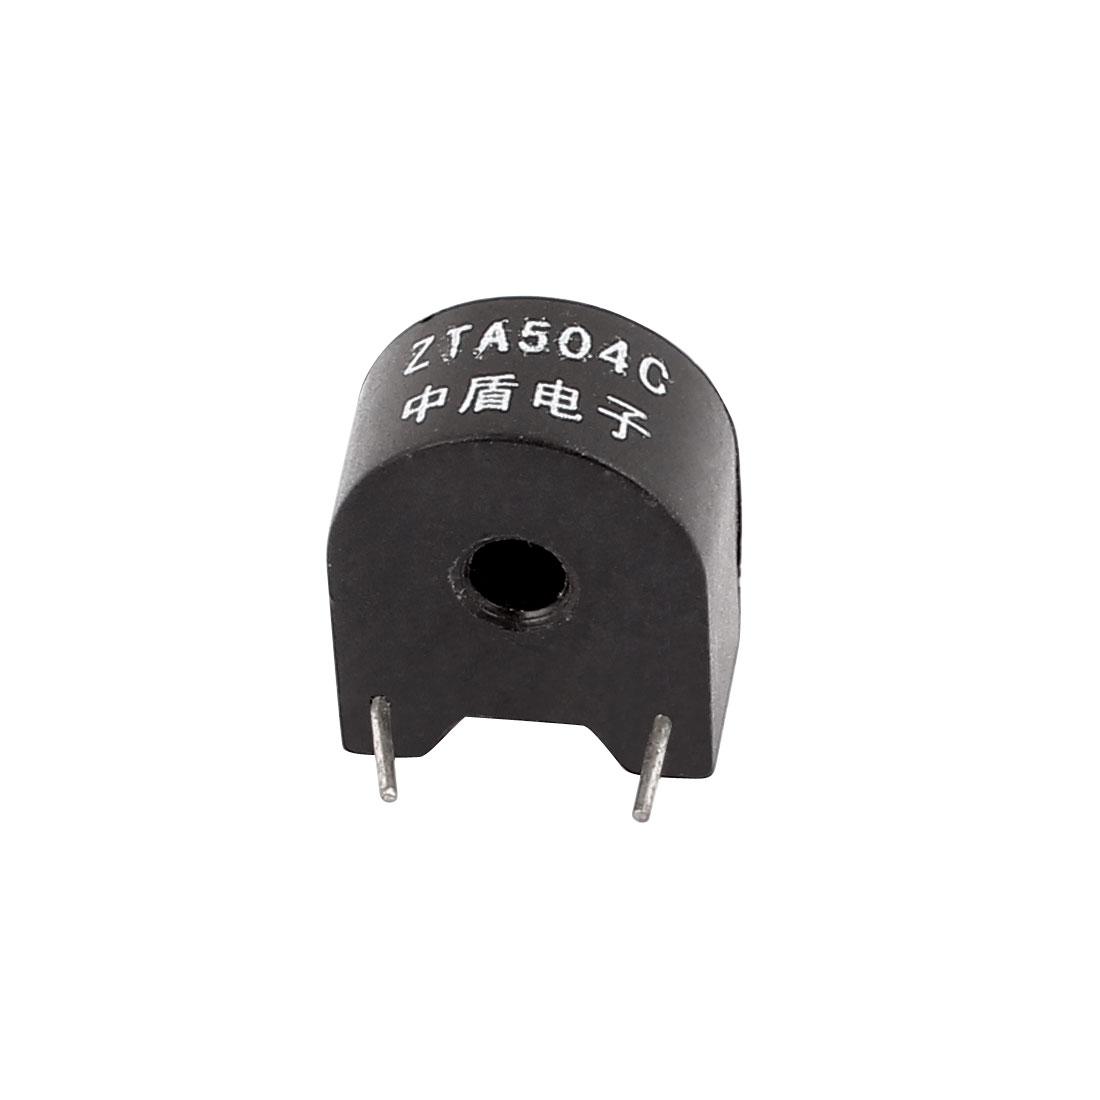 ZTA504C 5A/2.5mA 2 Terminal Precision AC Micro Current Transformer Sensor